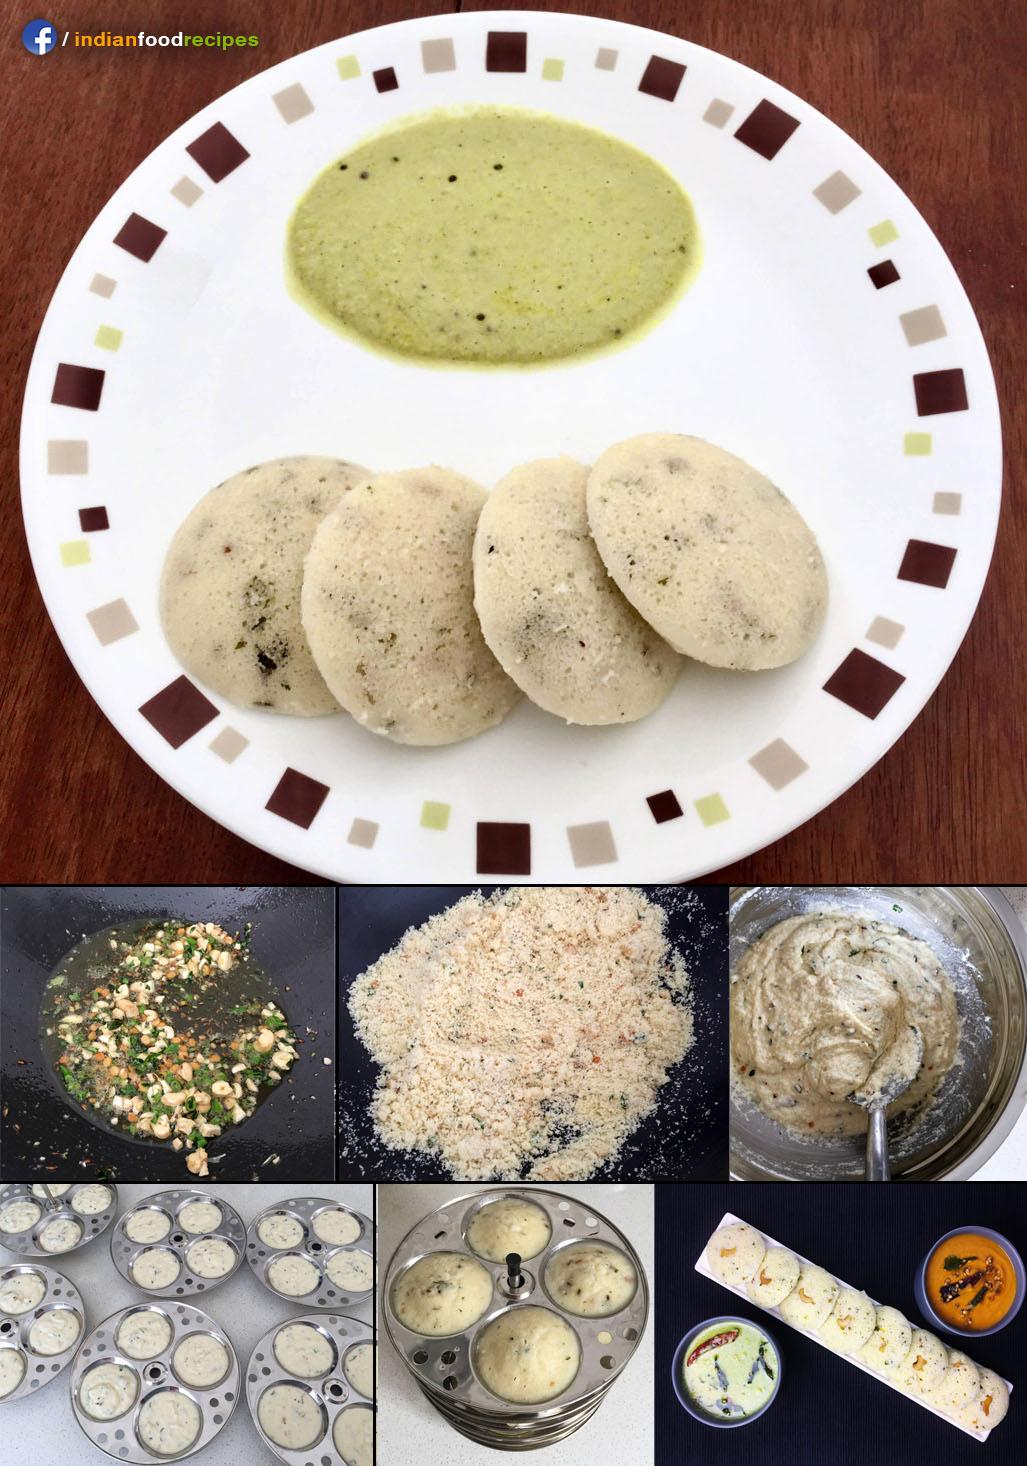 Rava Idli (Semolina Dumplings) recipe step by step